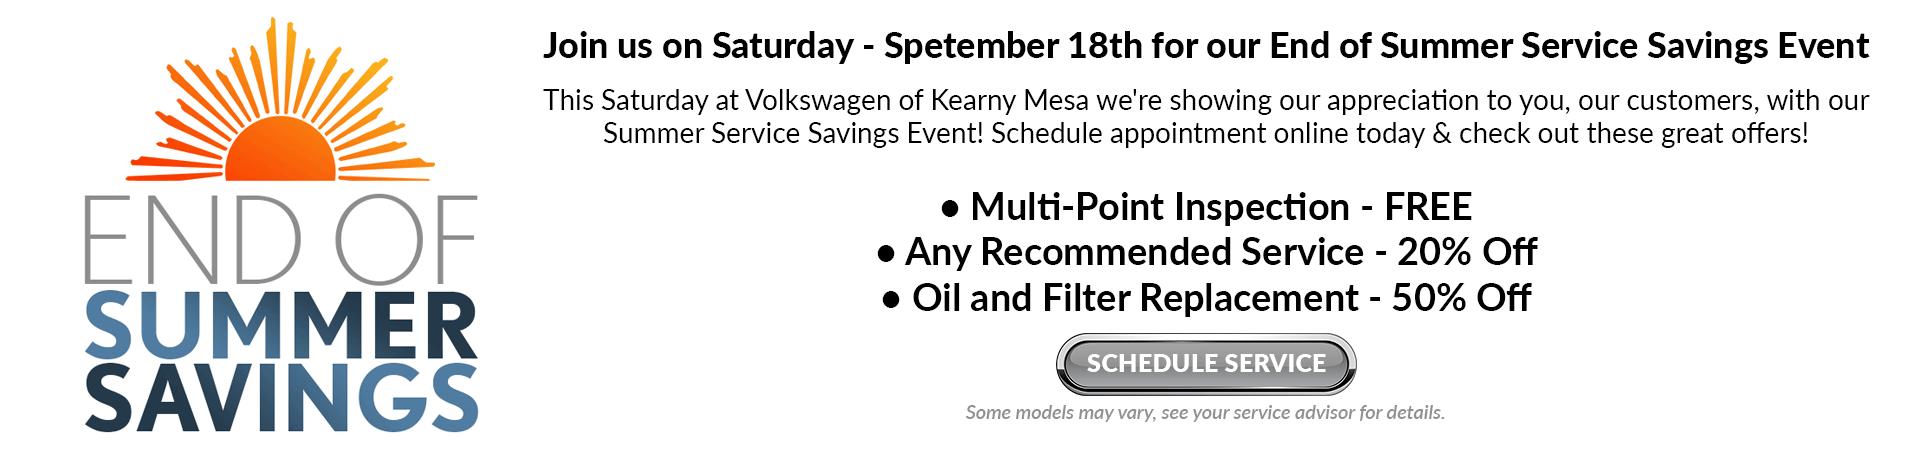 SEPT-web-Volkswagen-of-Kearny-Mesa